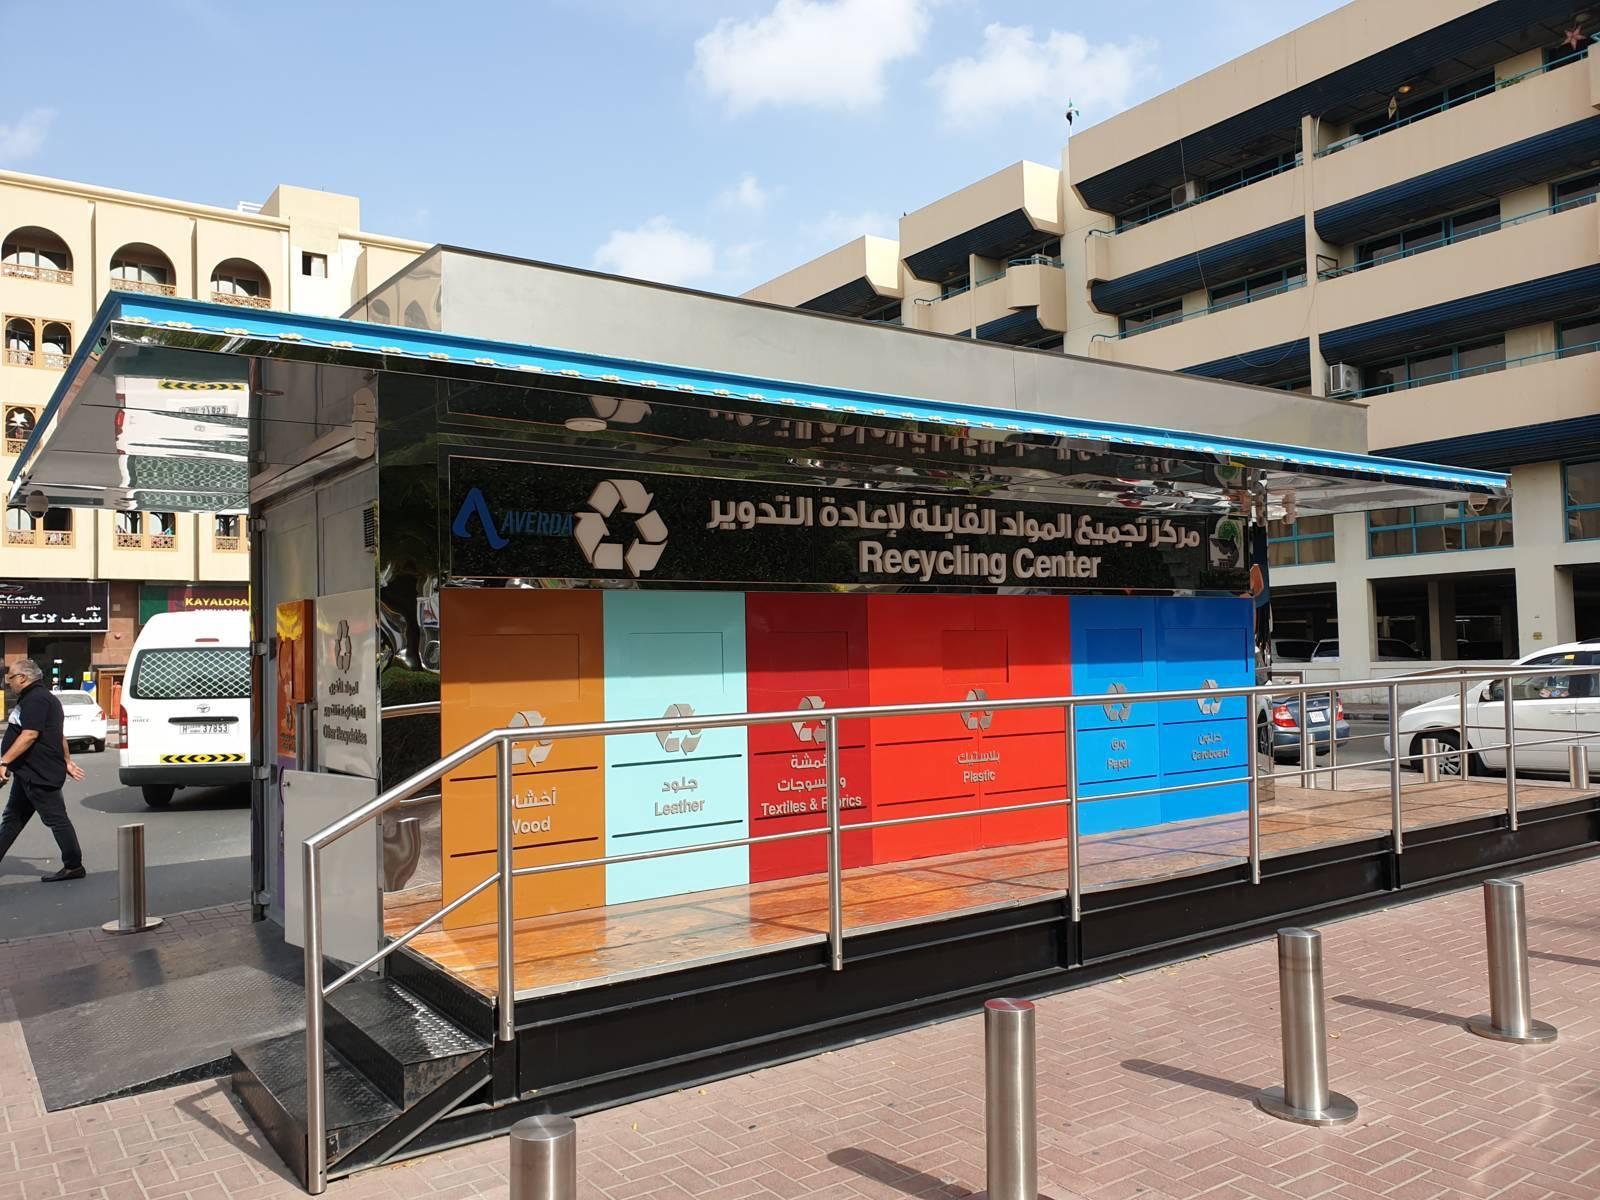 Recycling Center in Karama, Dubai